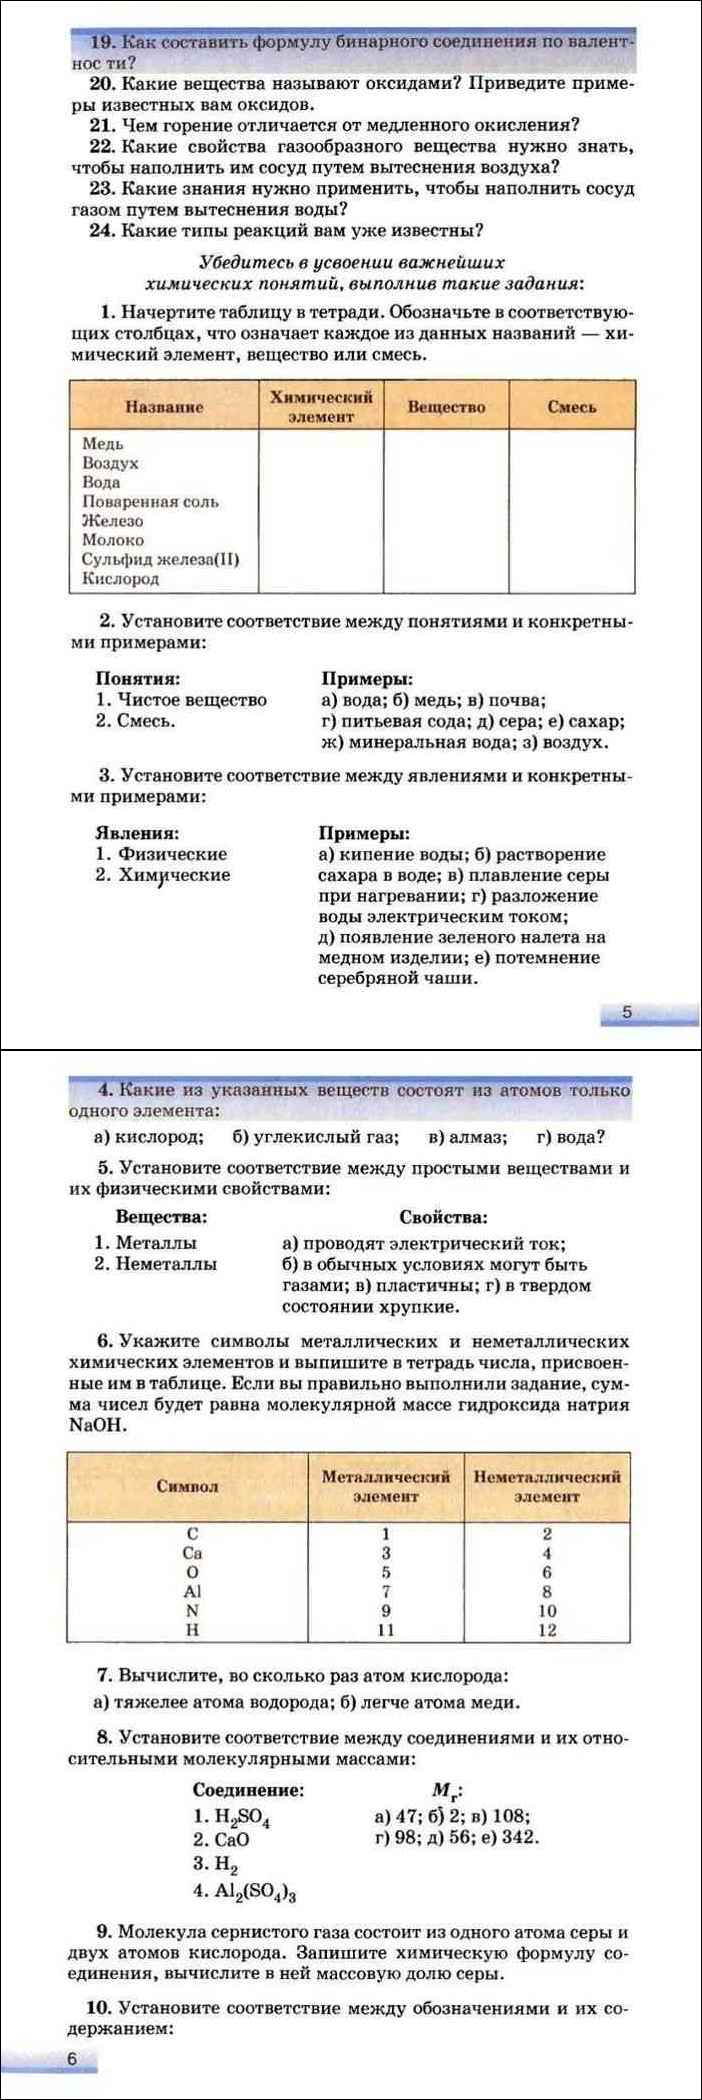 Пластичность (физика) - plasticity (physics) - qwe.wiki